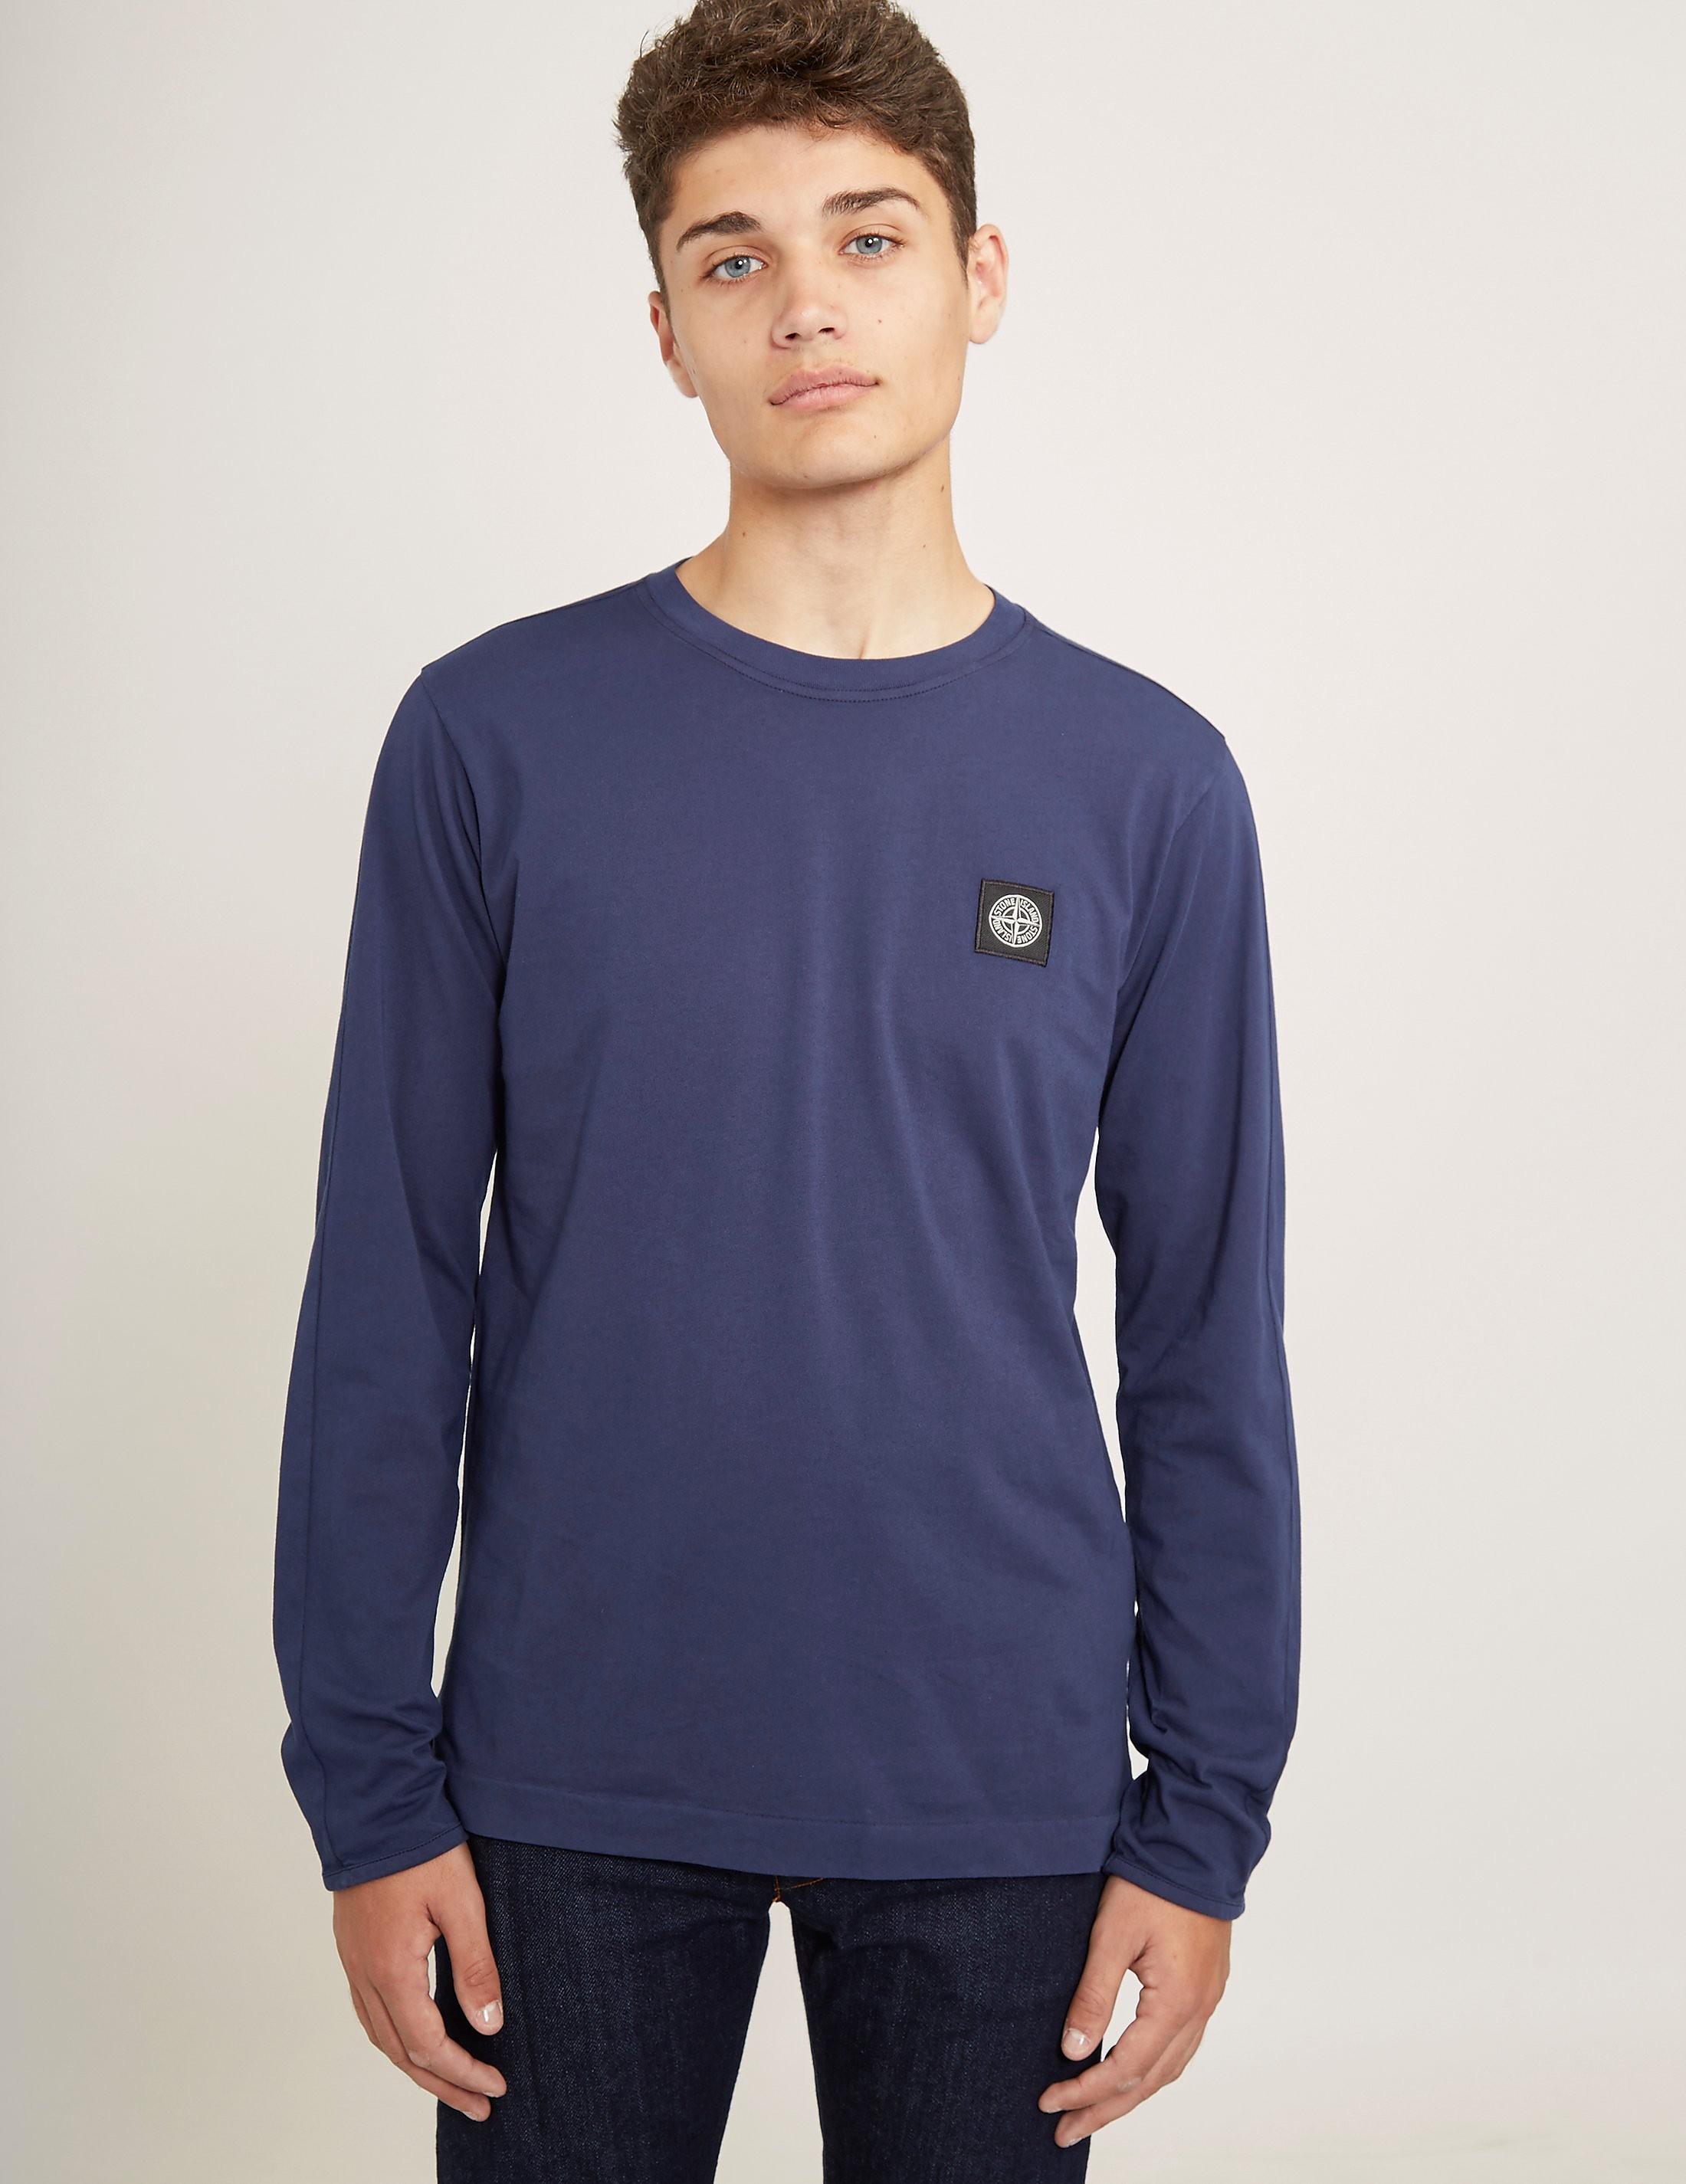 Stone Island Patch Long Sleeve T-Shirt